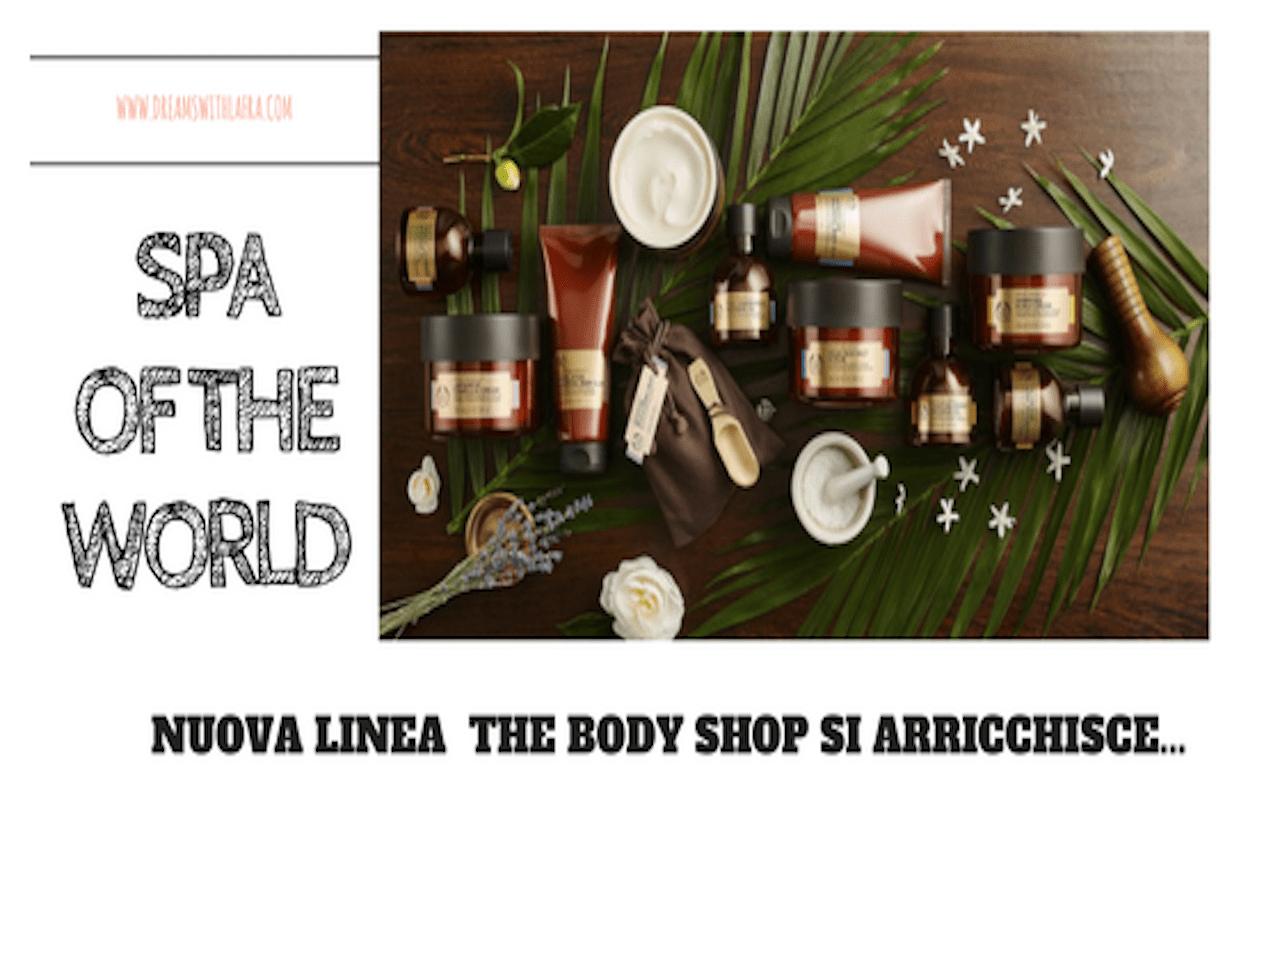 nuova linea Spa of The world THE BODY SHOP